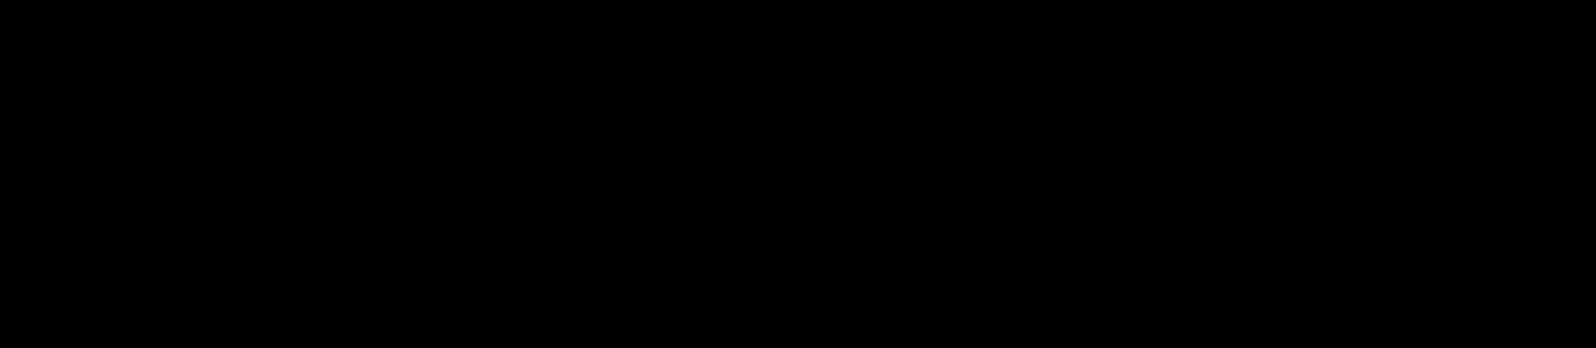 Bacchus株式会社